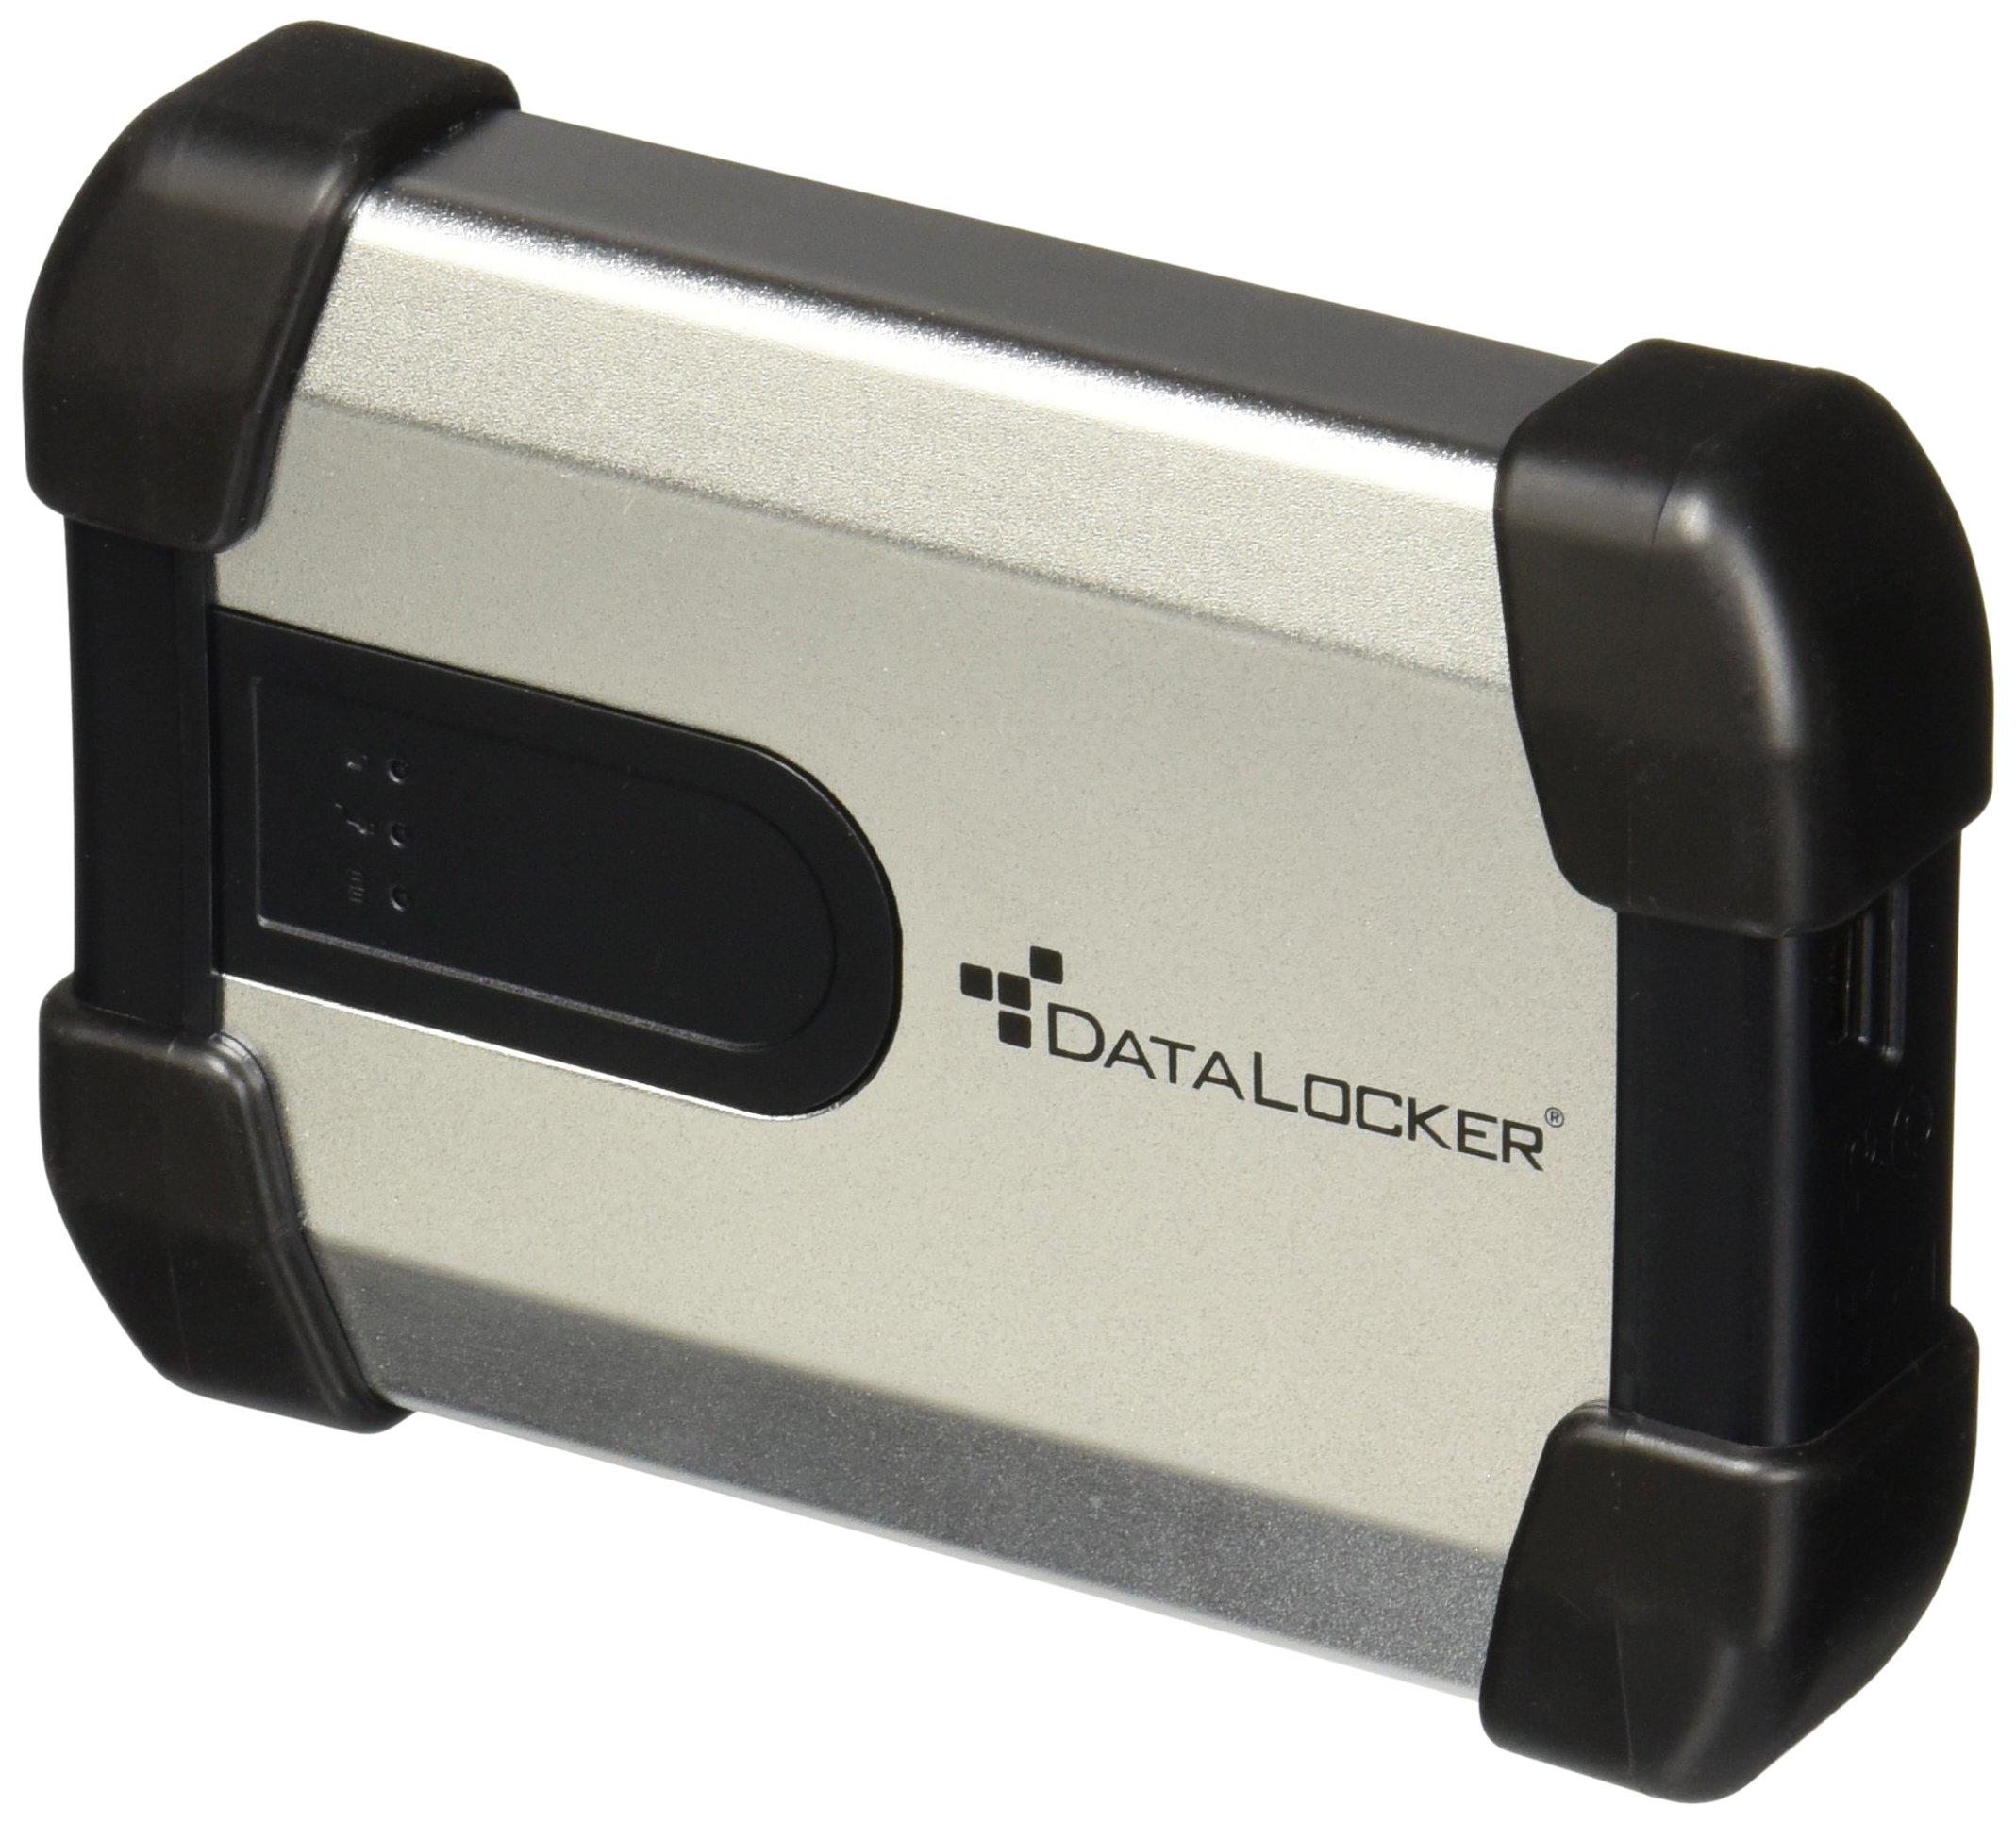 IronKey Defender H100 2.5 EHDD 1.0TB (MXCB1B001T4001FIPS) by IronKey (Image #1)